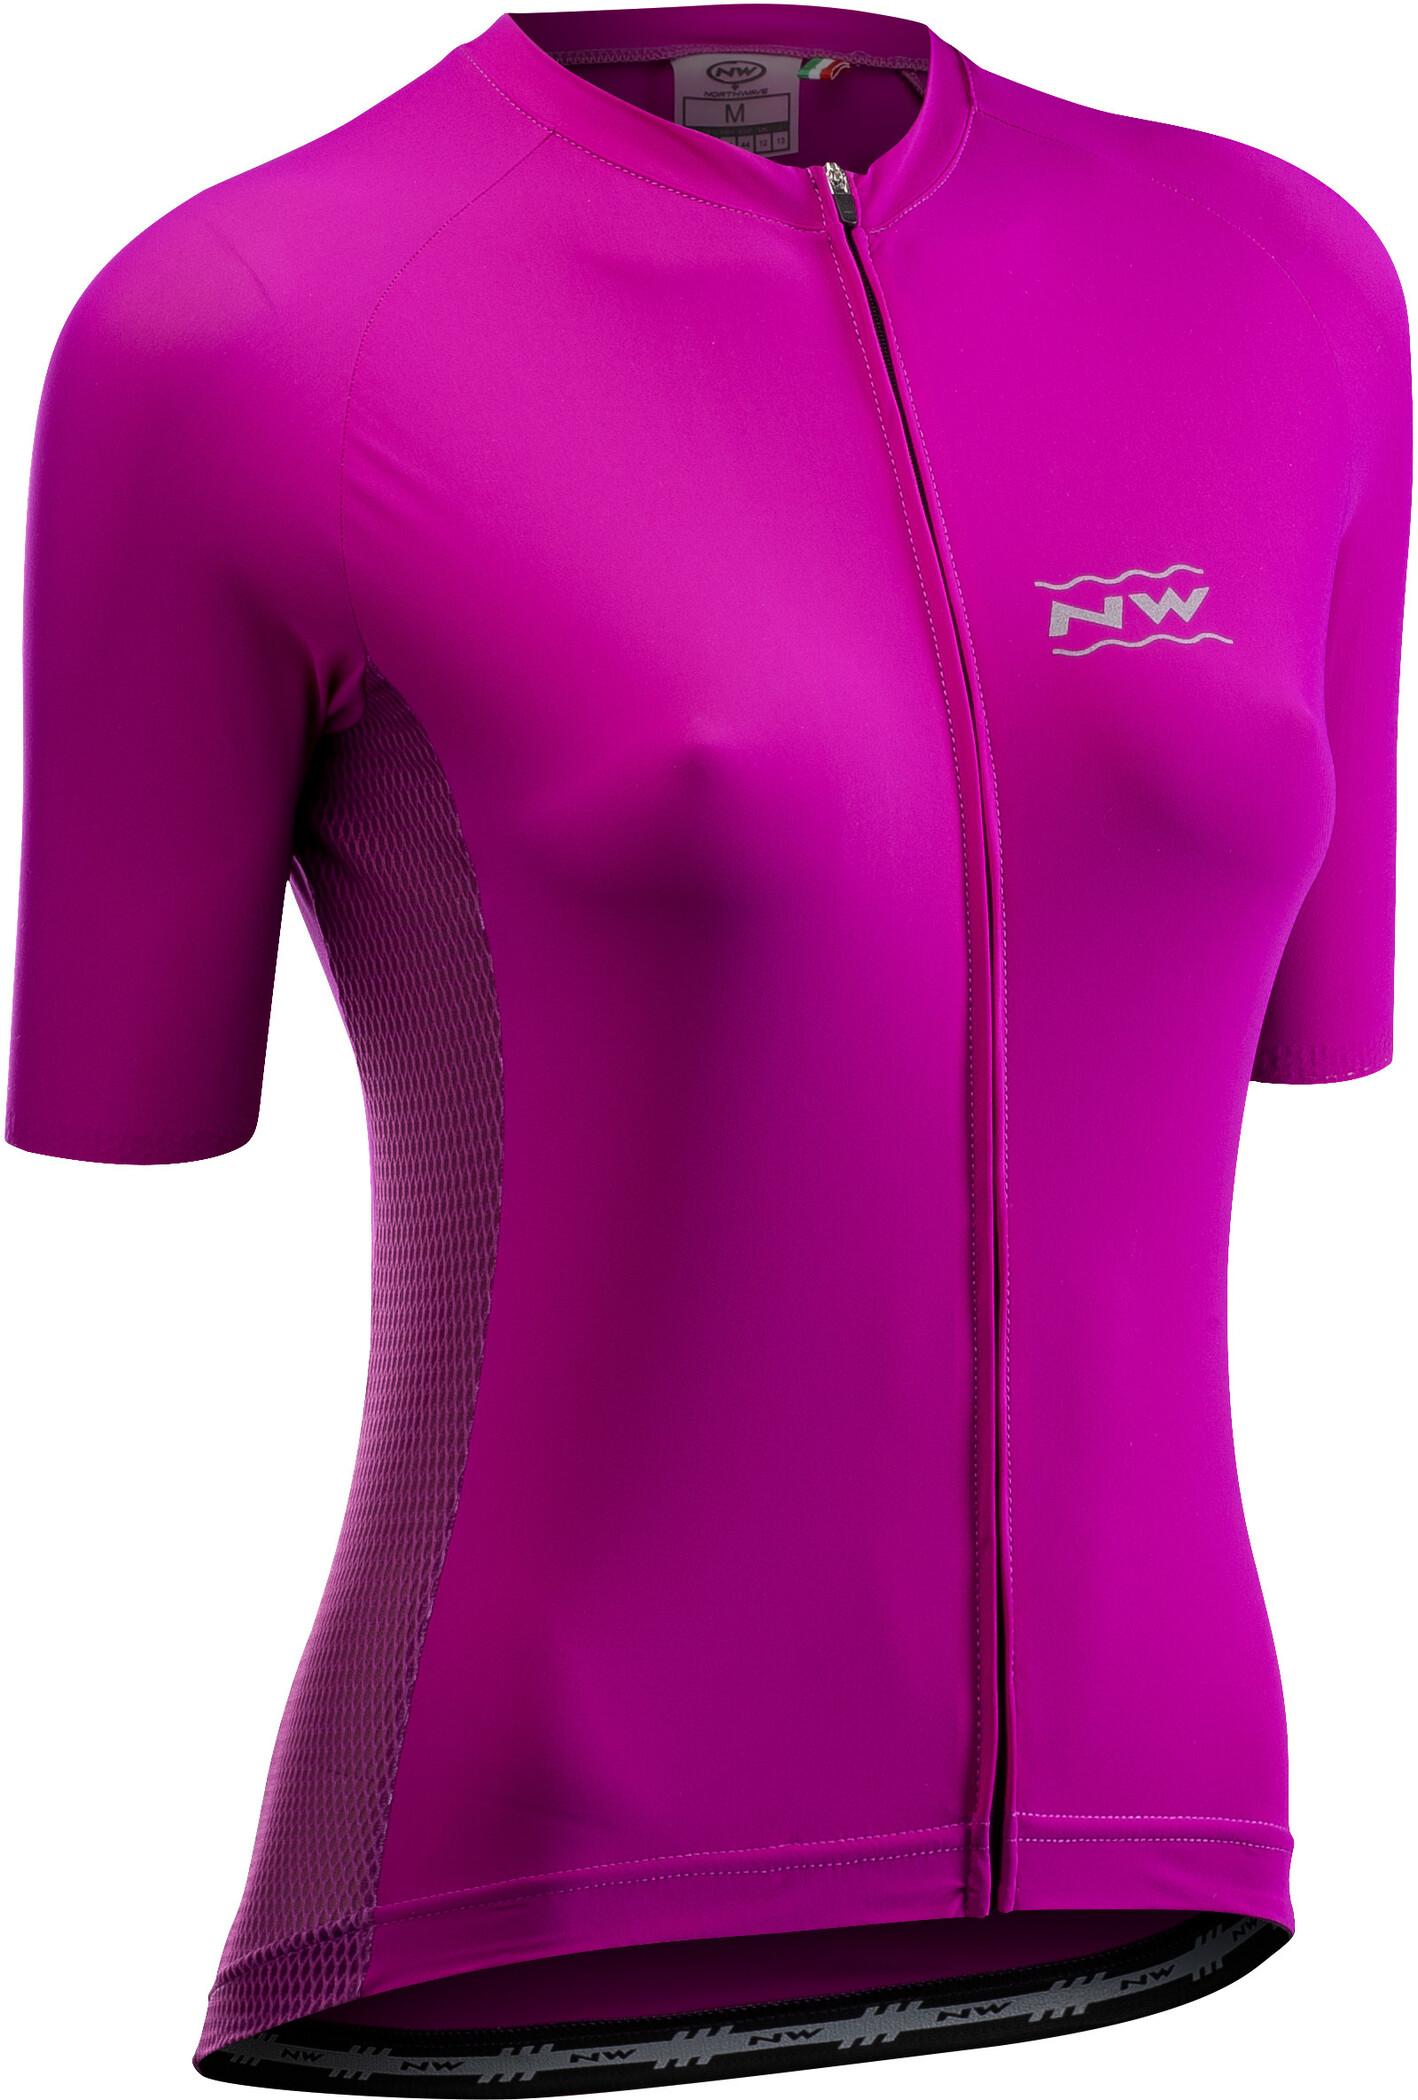 Northwave Xtrail Damen Fahrrad Trikot kurz pink//grün 2020